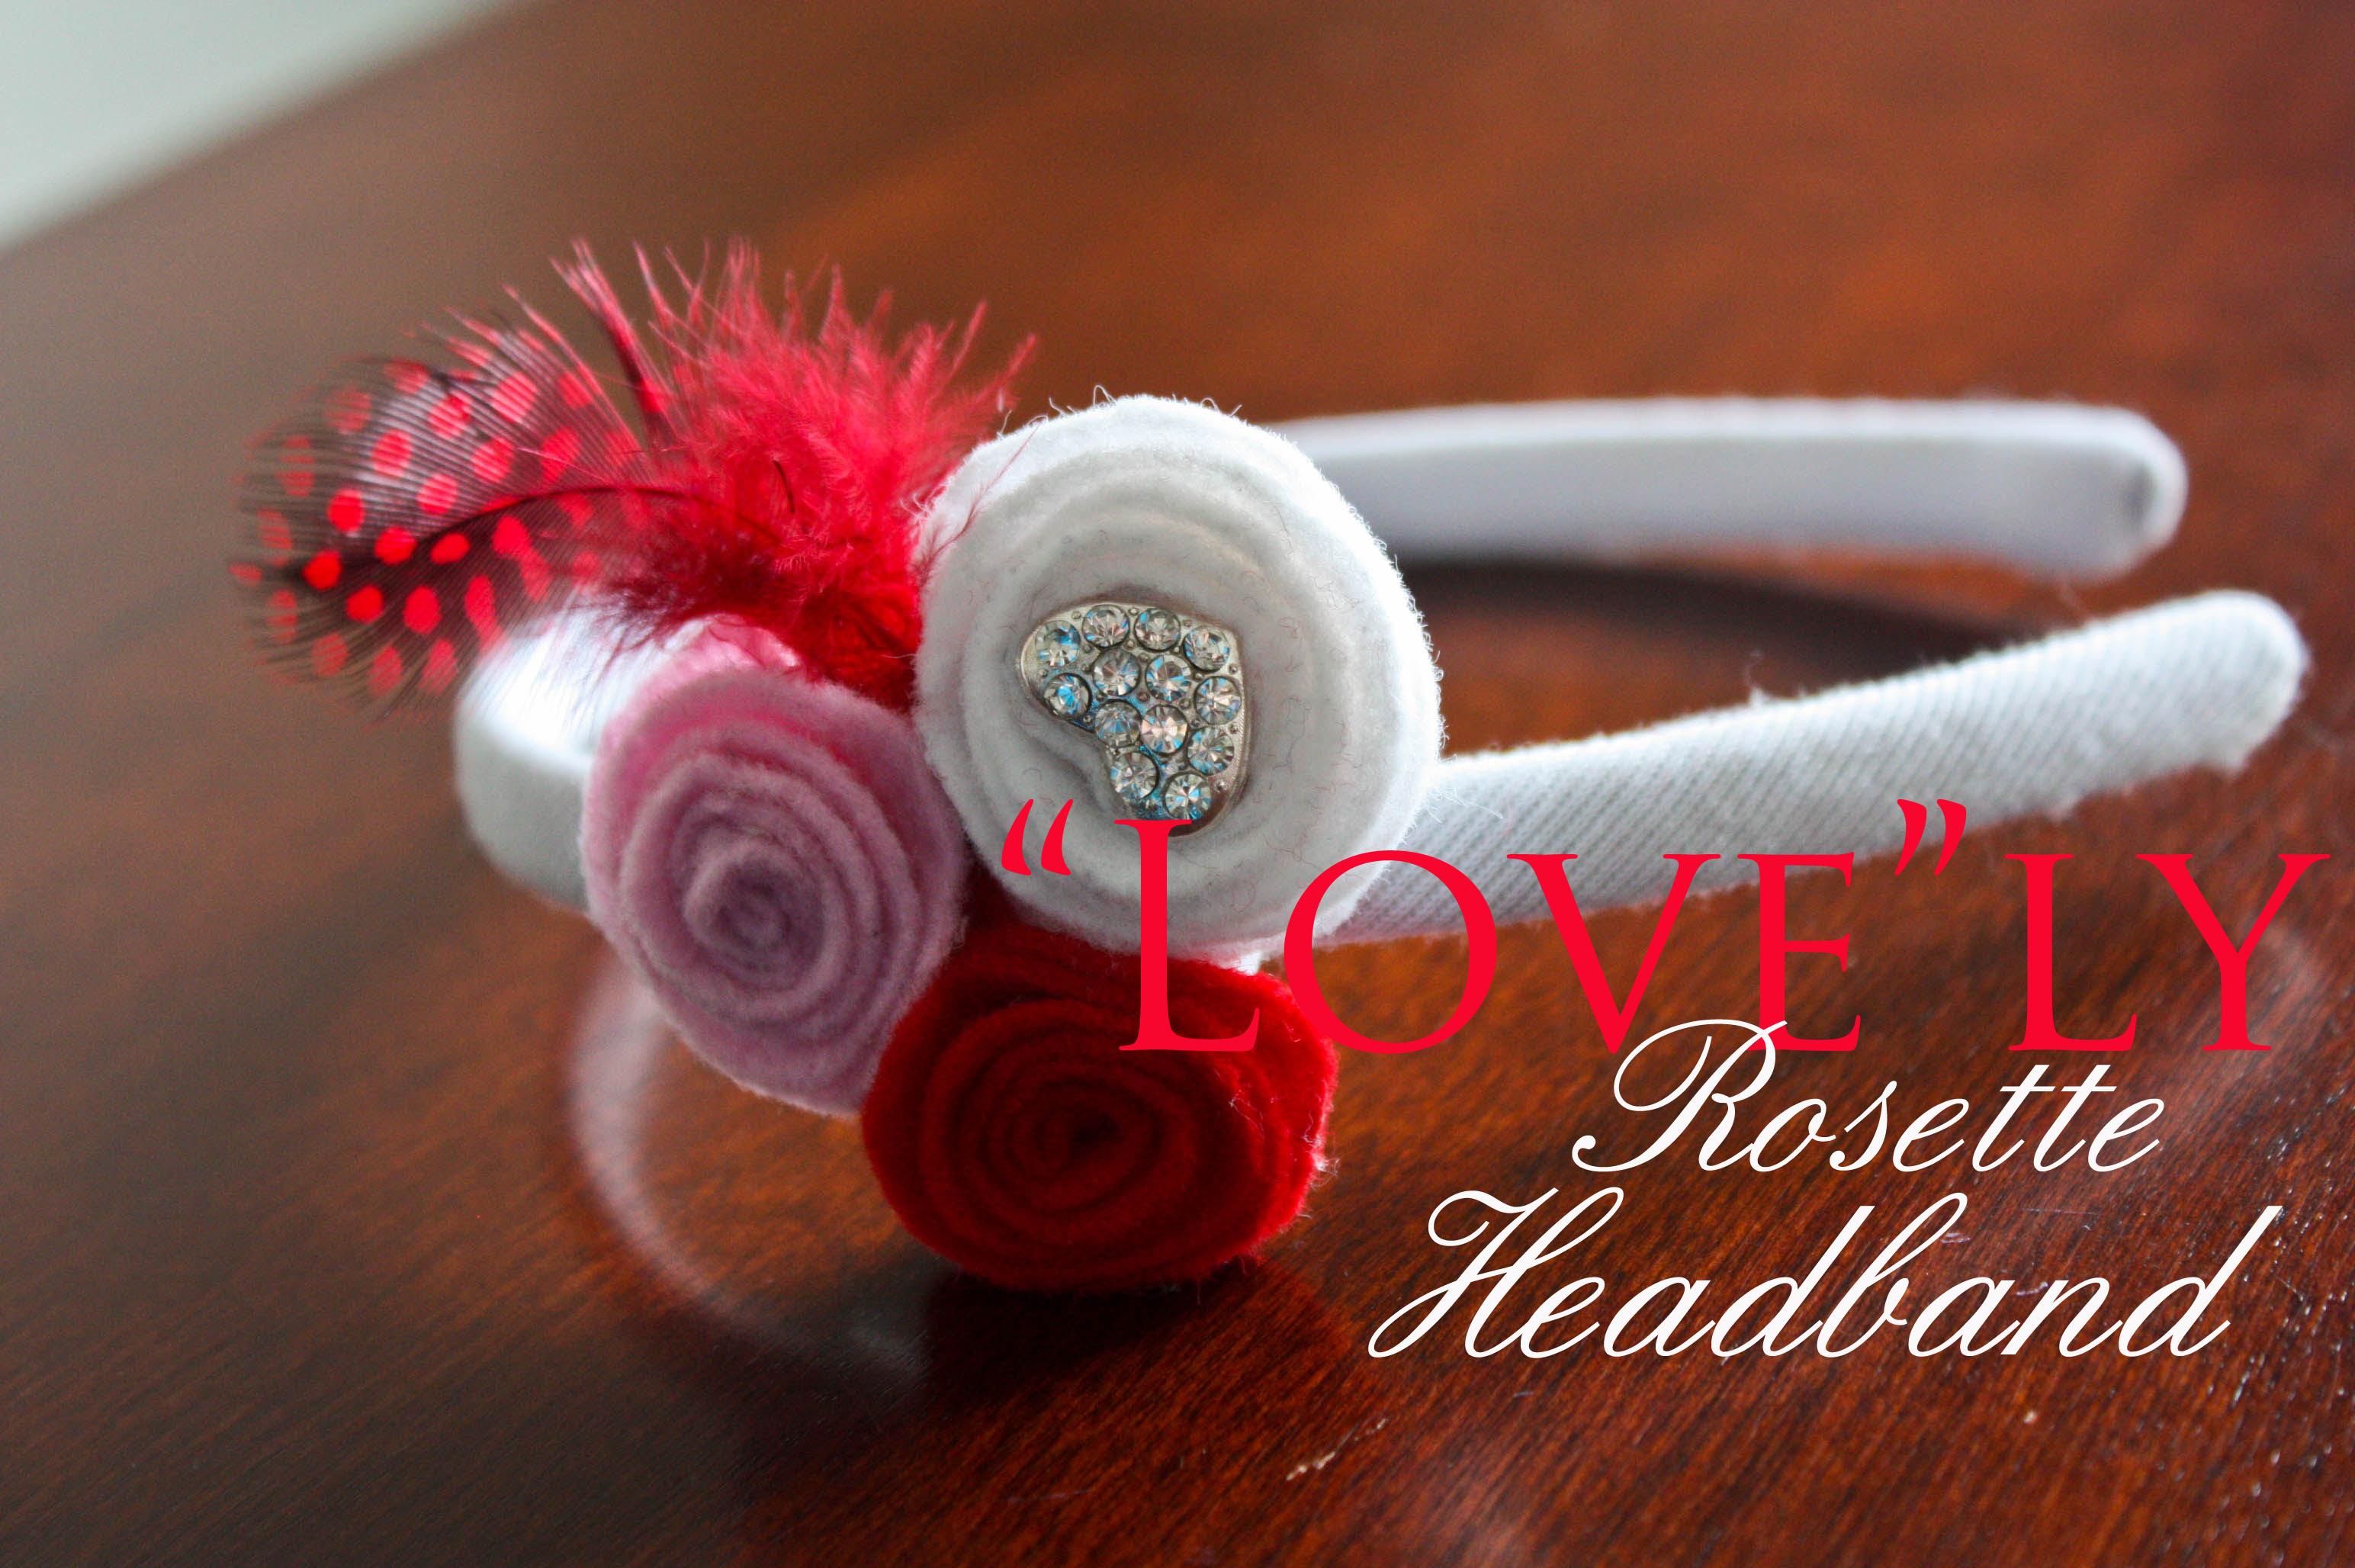 """Love""ly Rosette Headband"